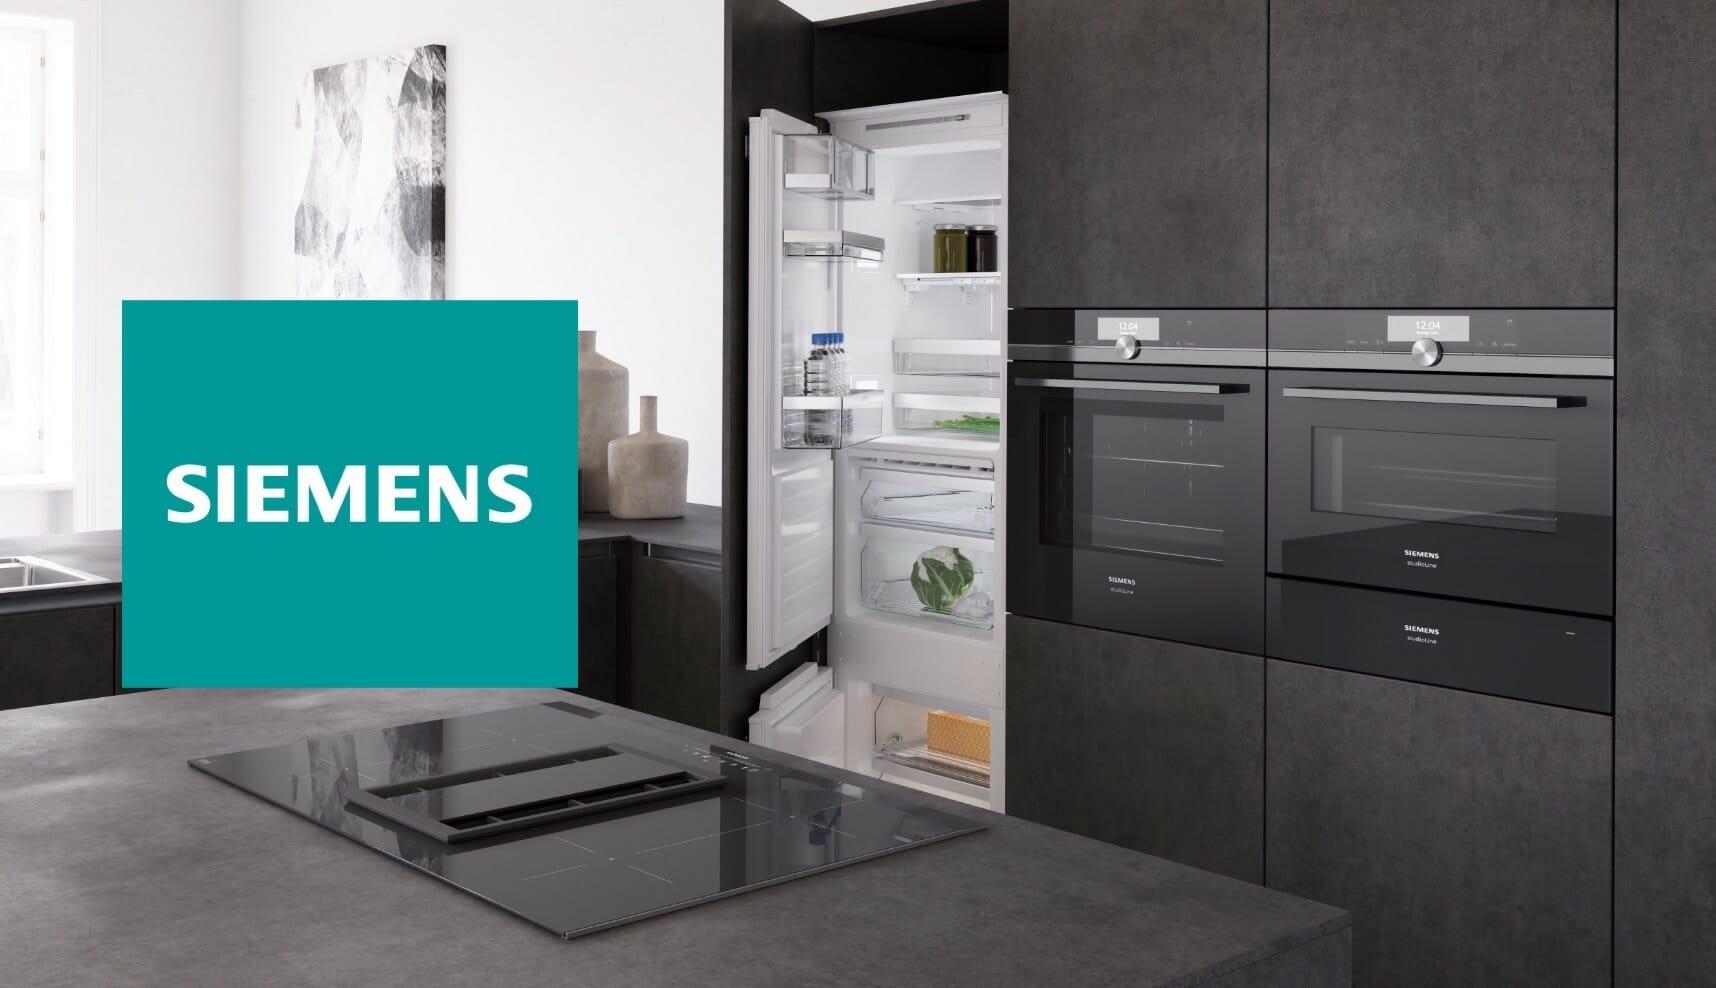 Siemens Appliance Partner